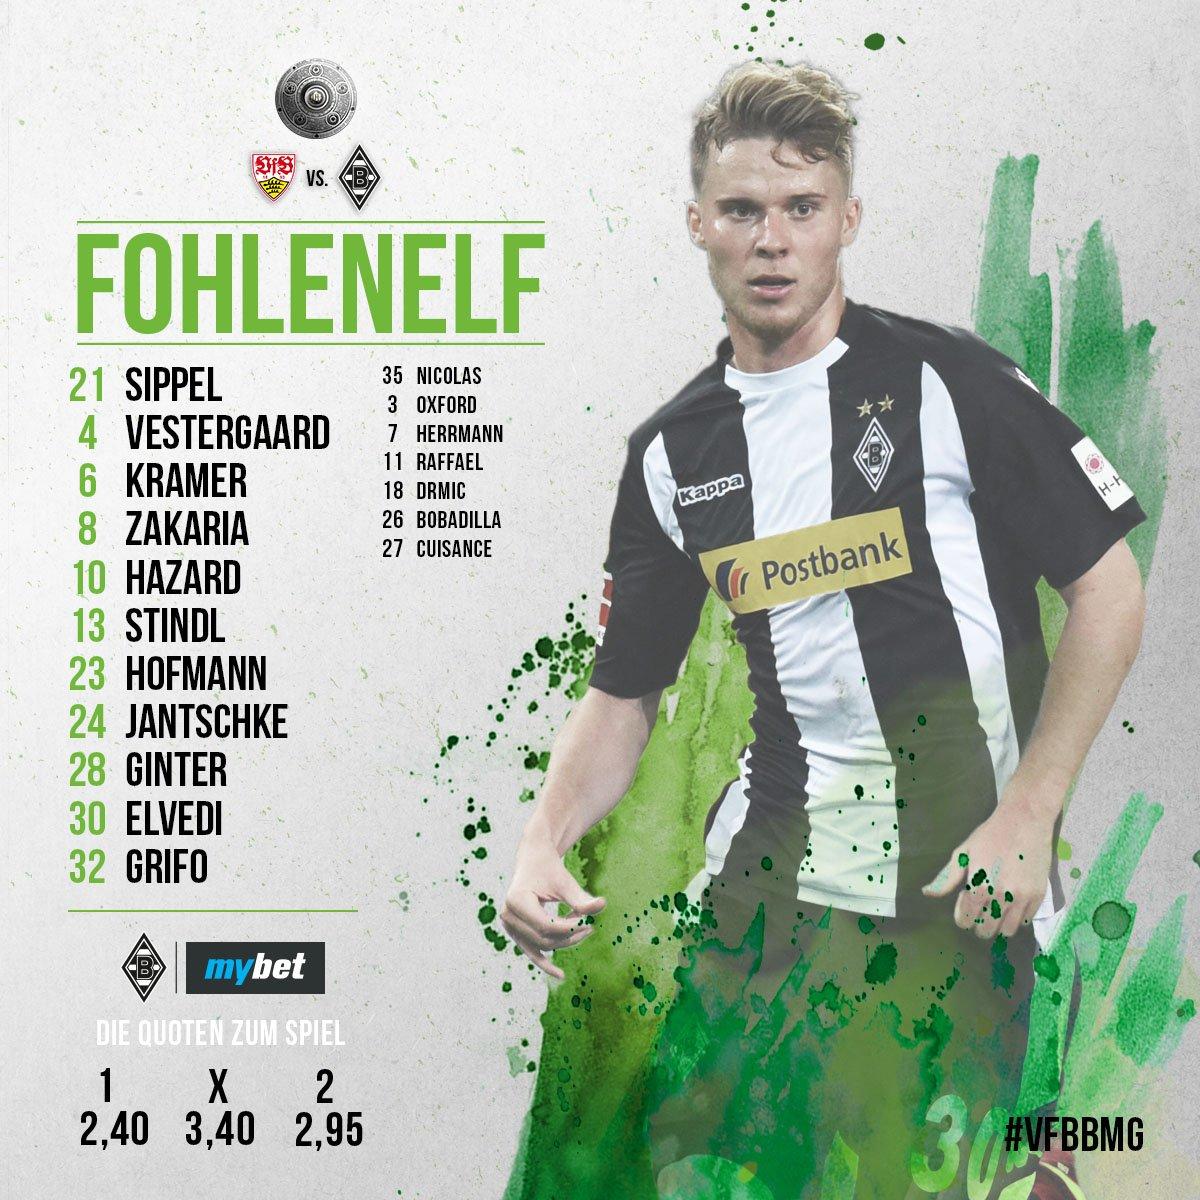 #Fohlenelf